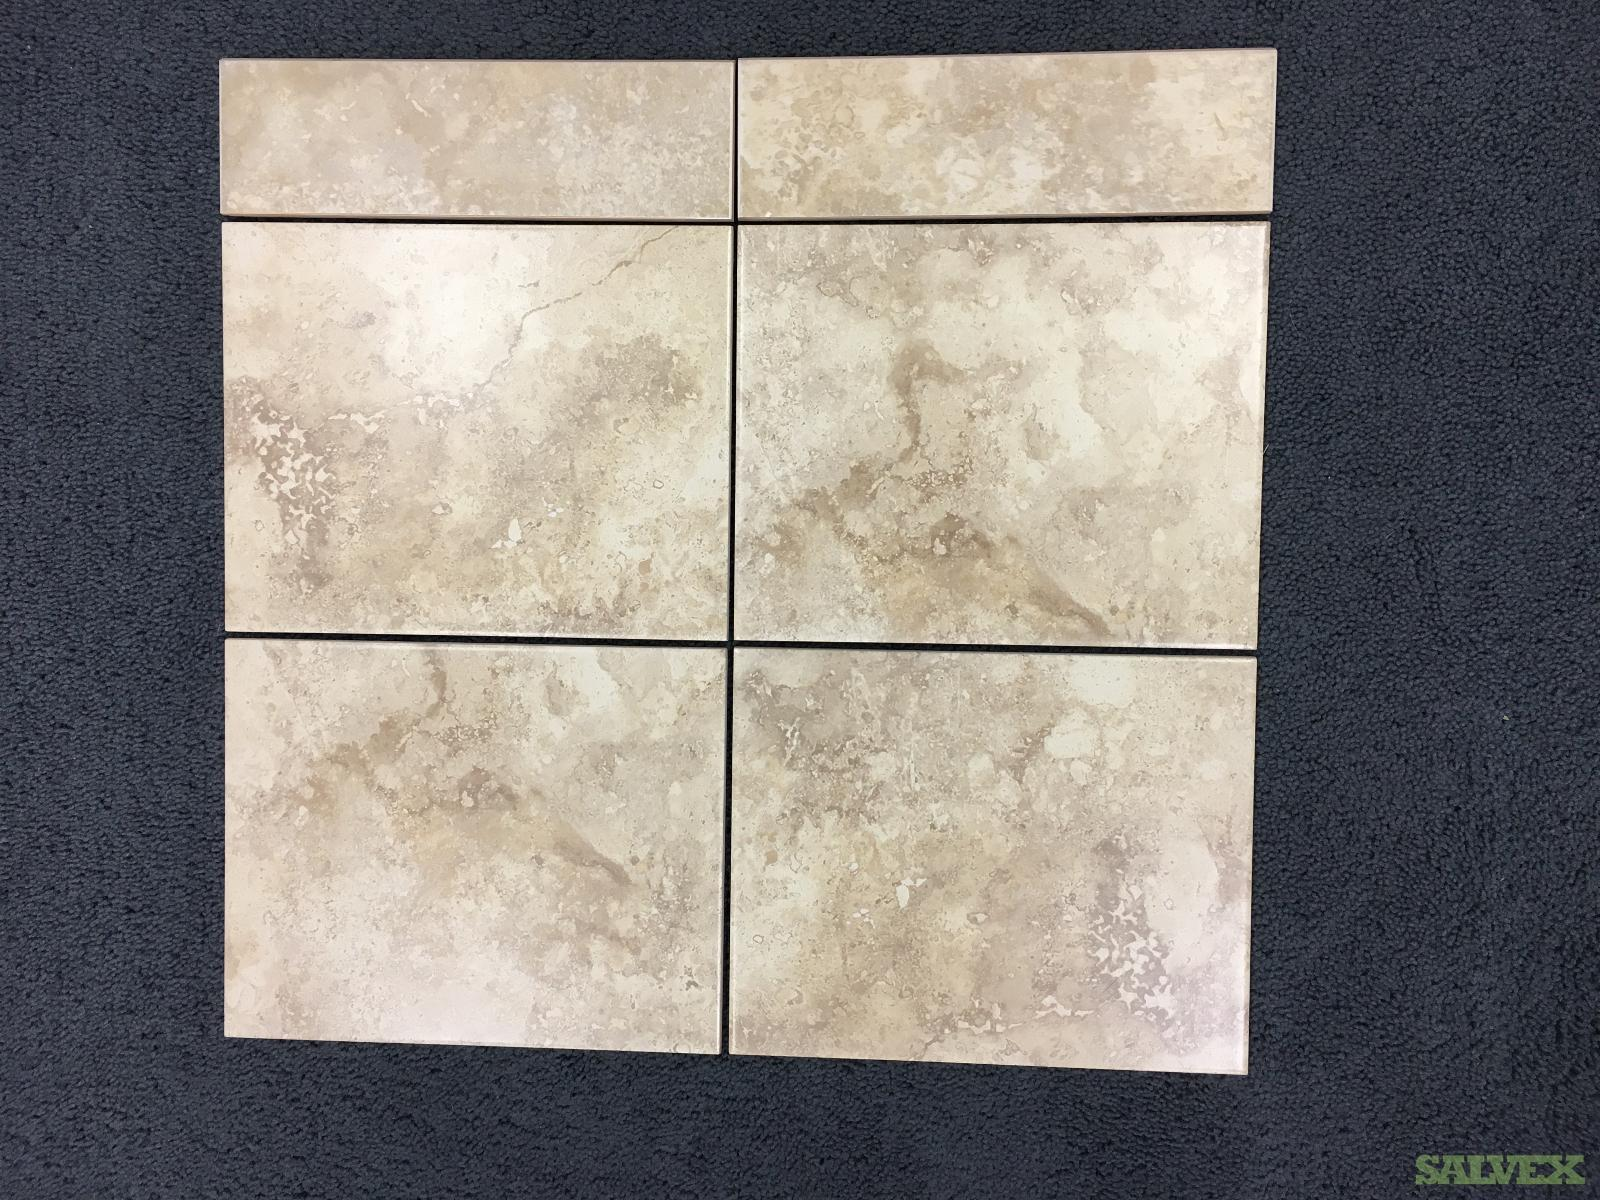 Italian Ceramic Wall Tile, Nice Rustic Pattern and Spanish Porcelain Stone Look Tile (40,678.47 SF) in Minnesota